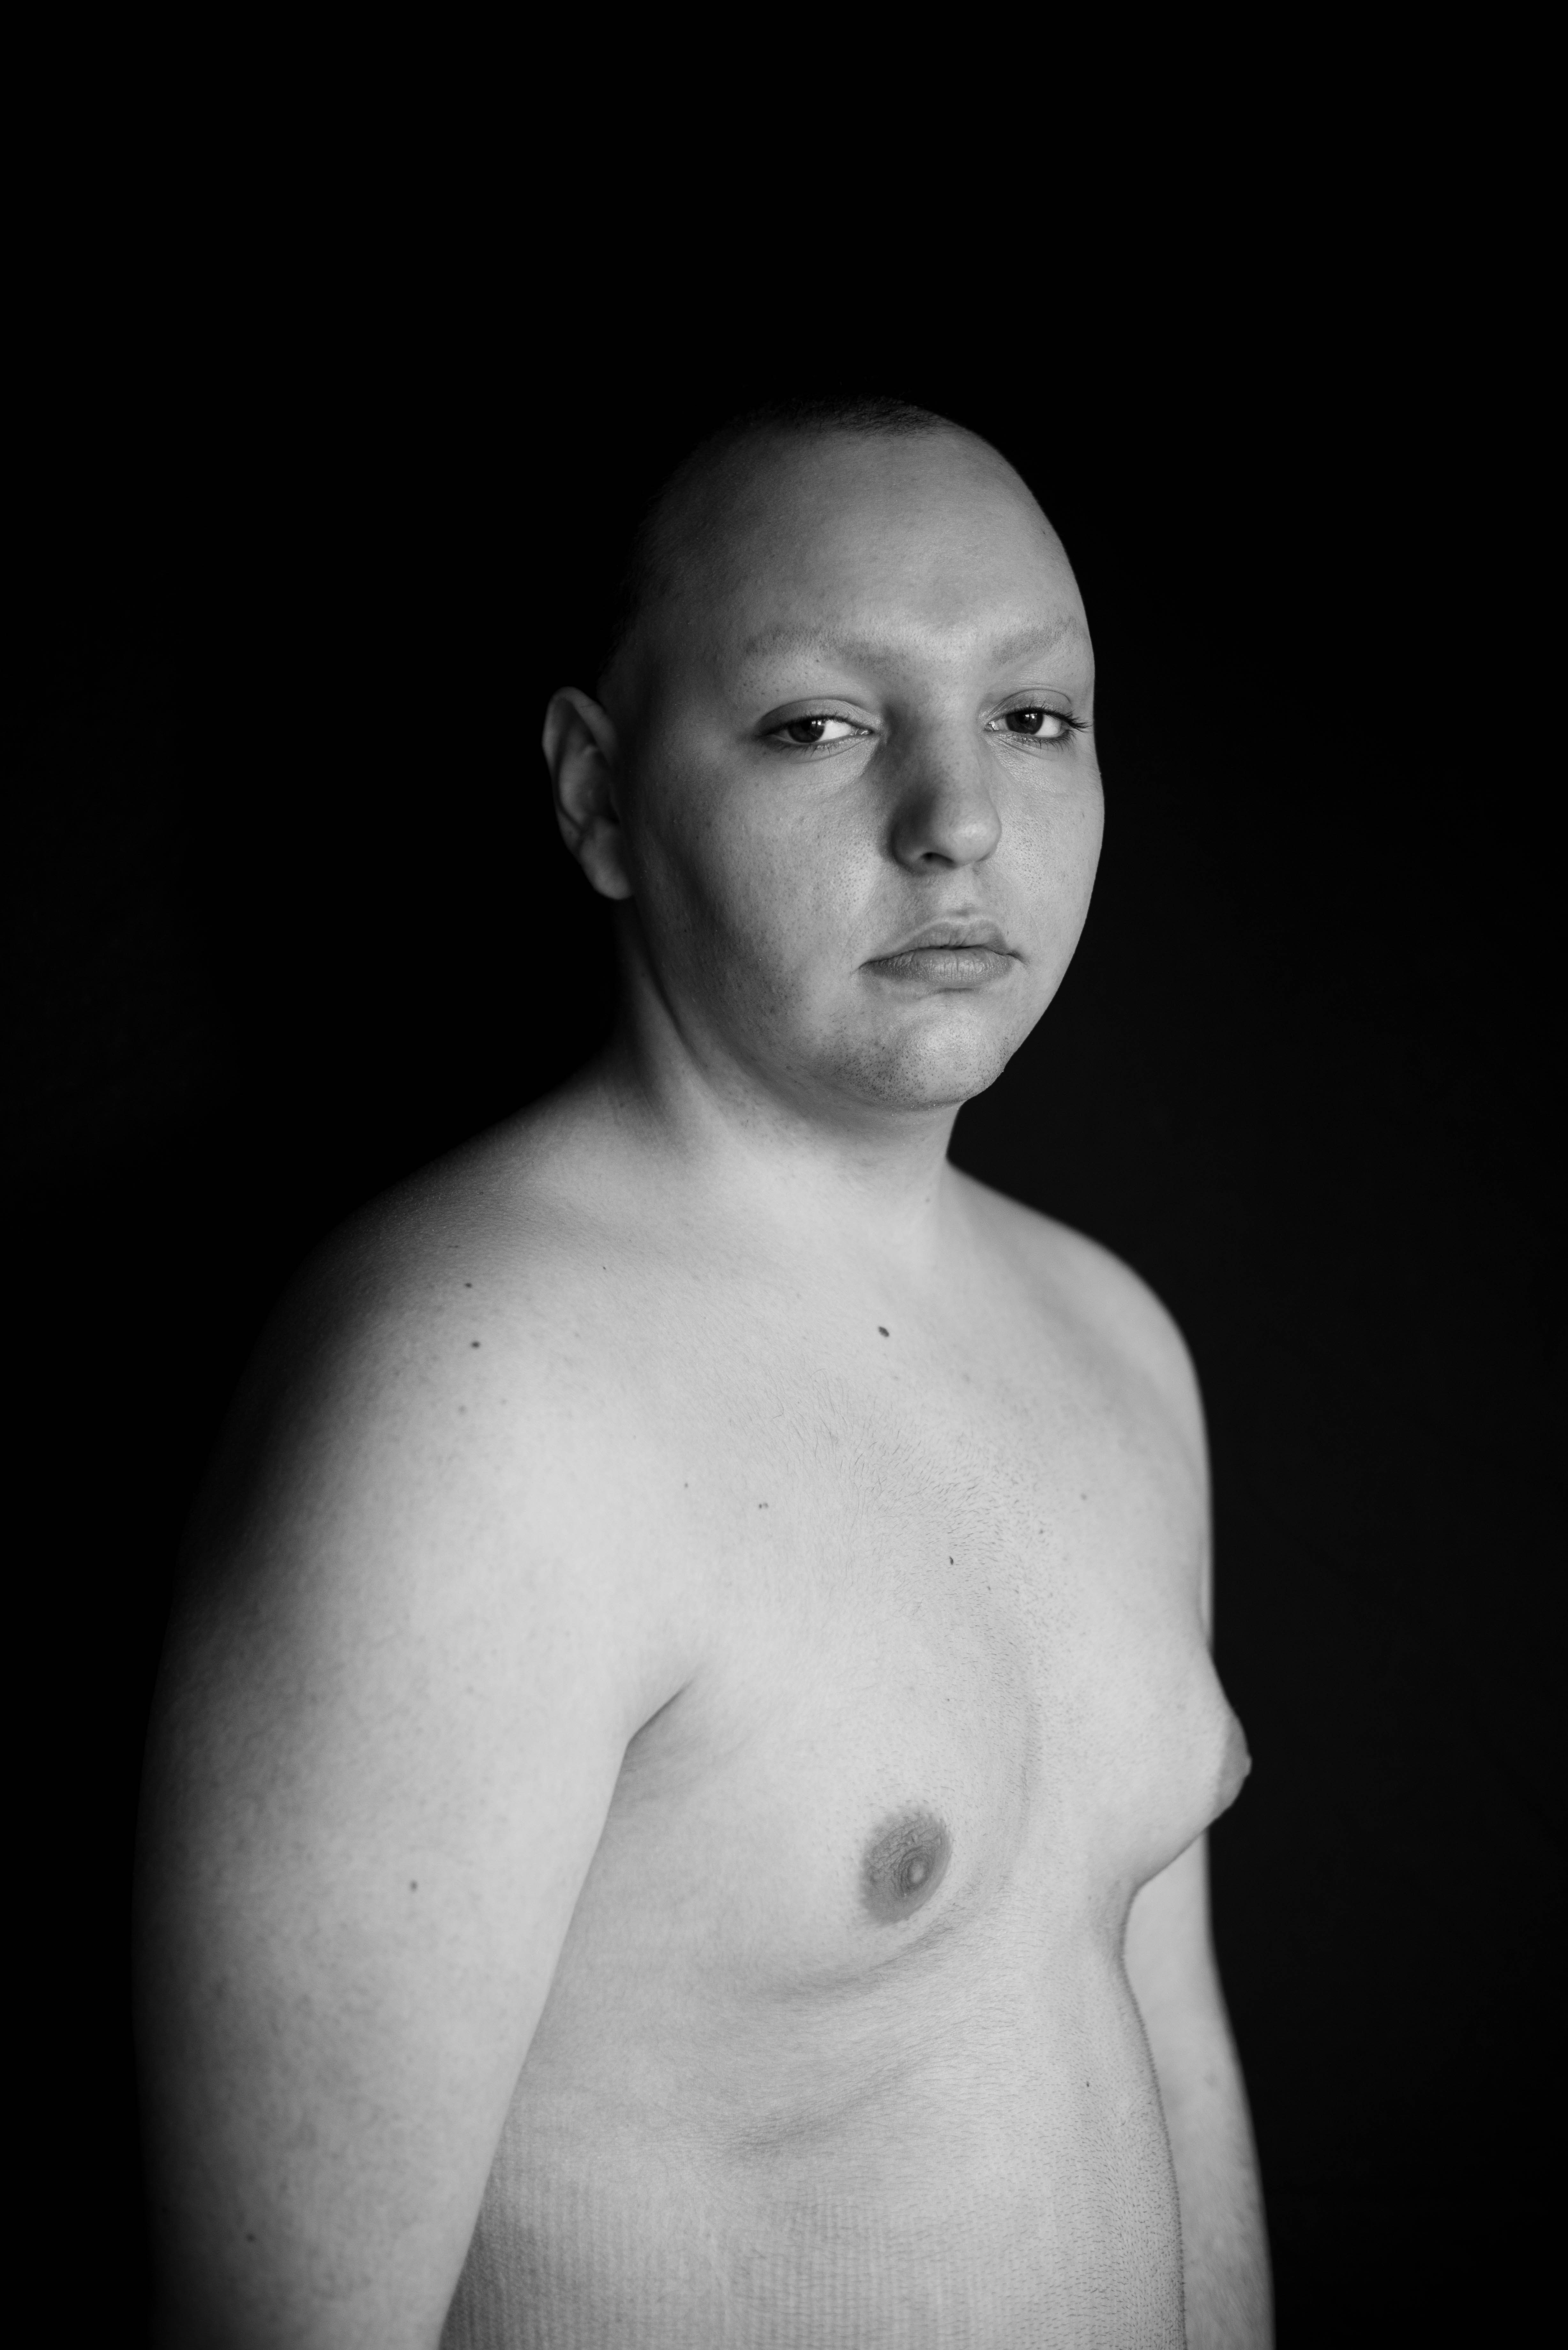 201119_MONA-CEDRIC_014